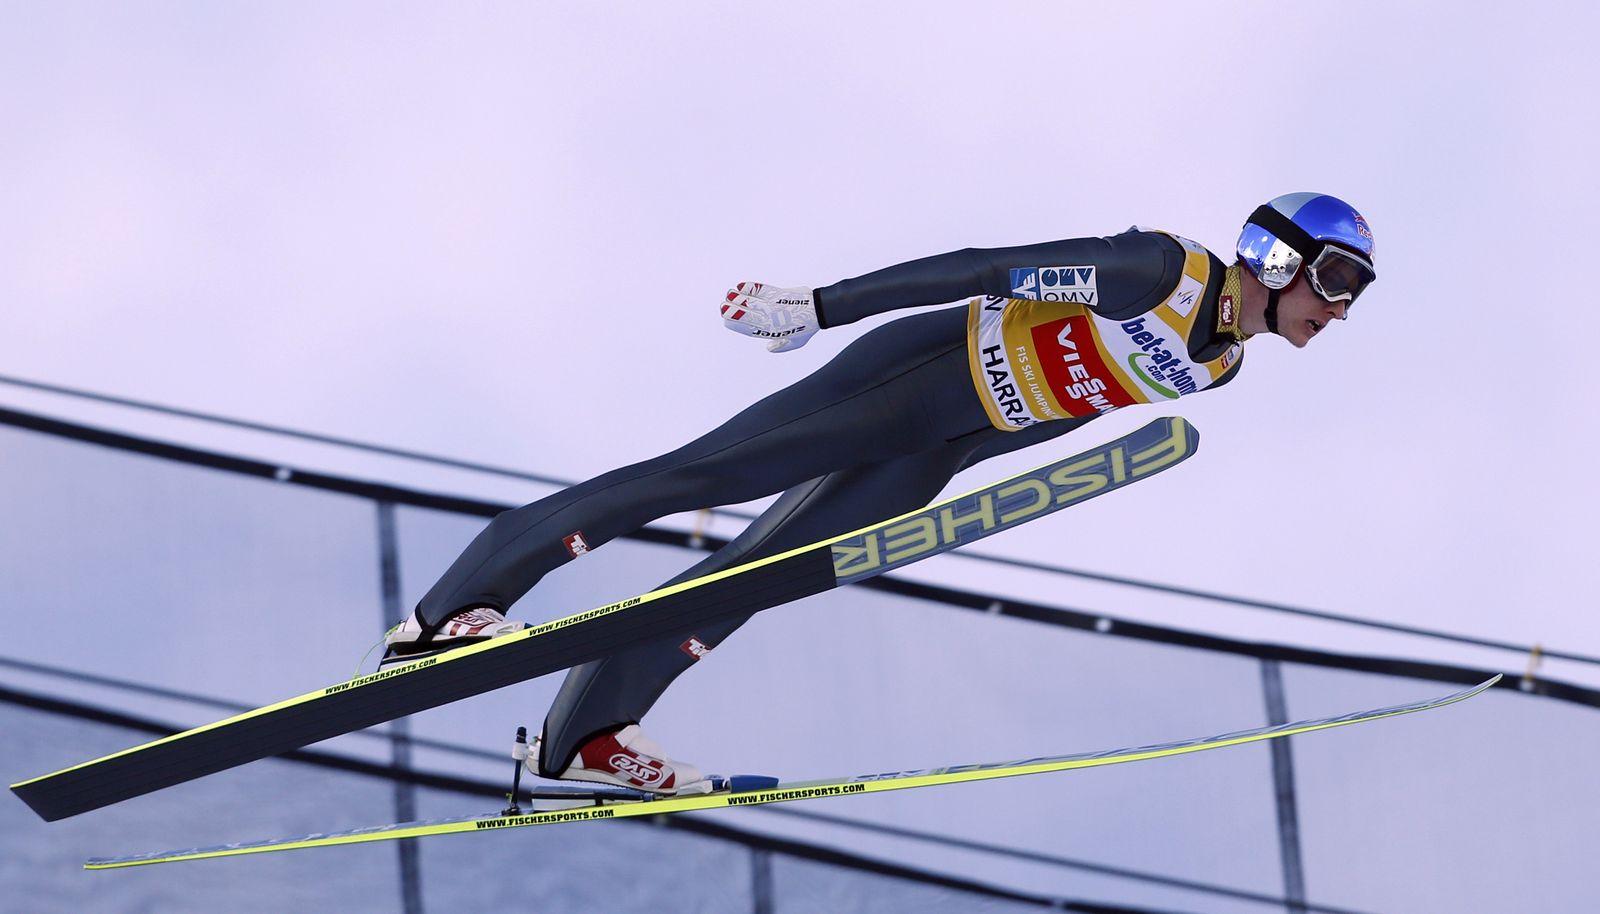 Czech Republic Ski Jumping